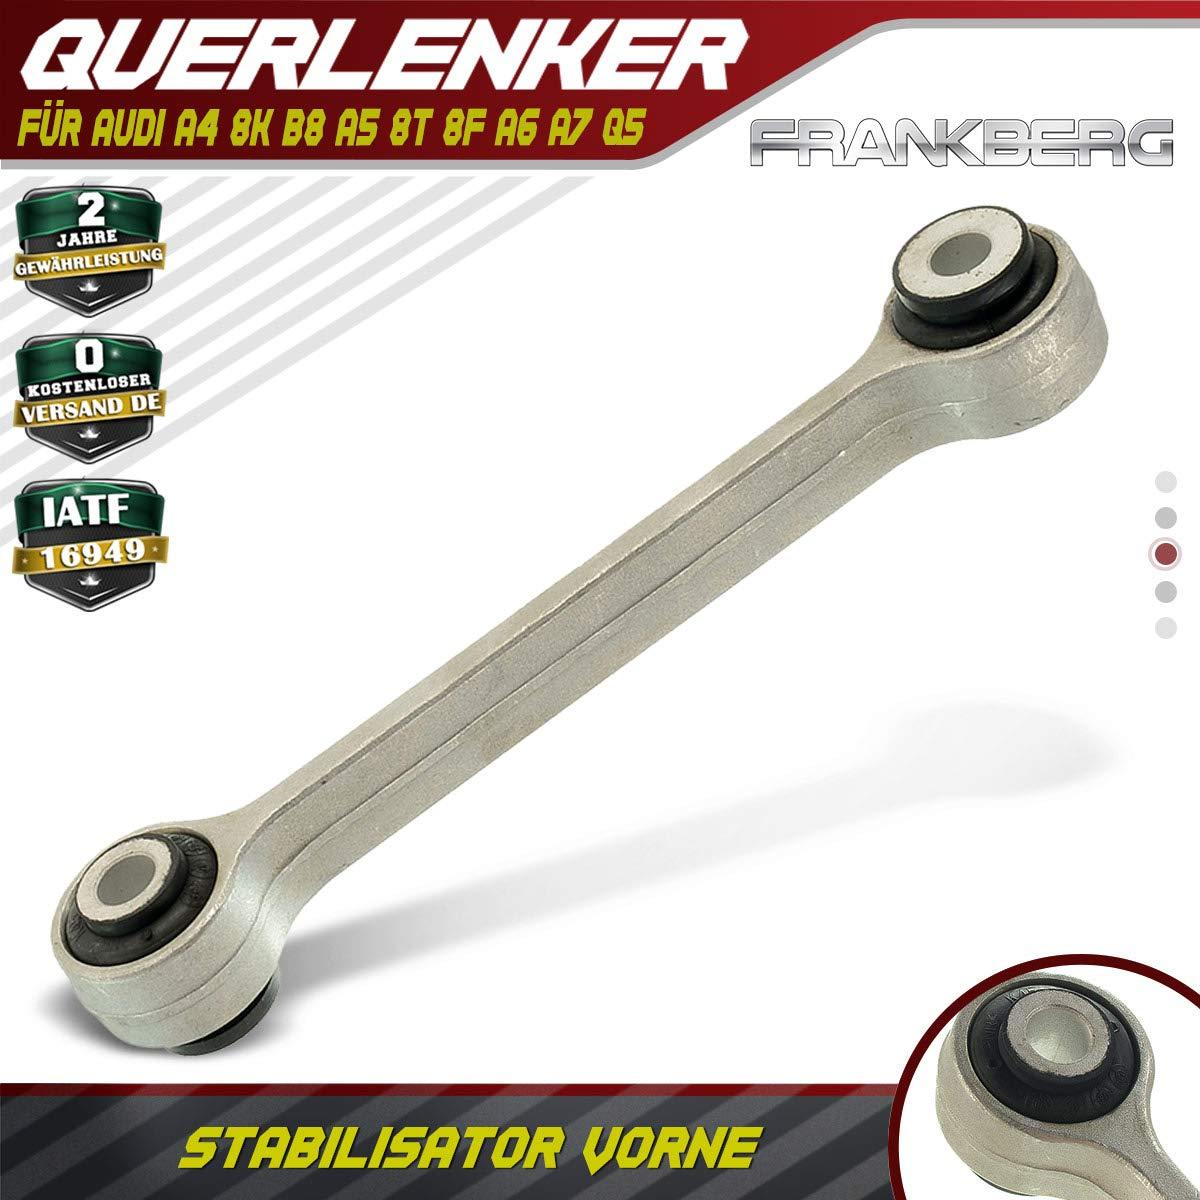 Koppelstange Stabi Strebe Stabilisator Vorne f/ür A4 8K B8 A5 8T 8F A6 A7 Q5 2007-2017 8K0411317C